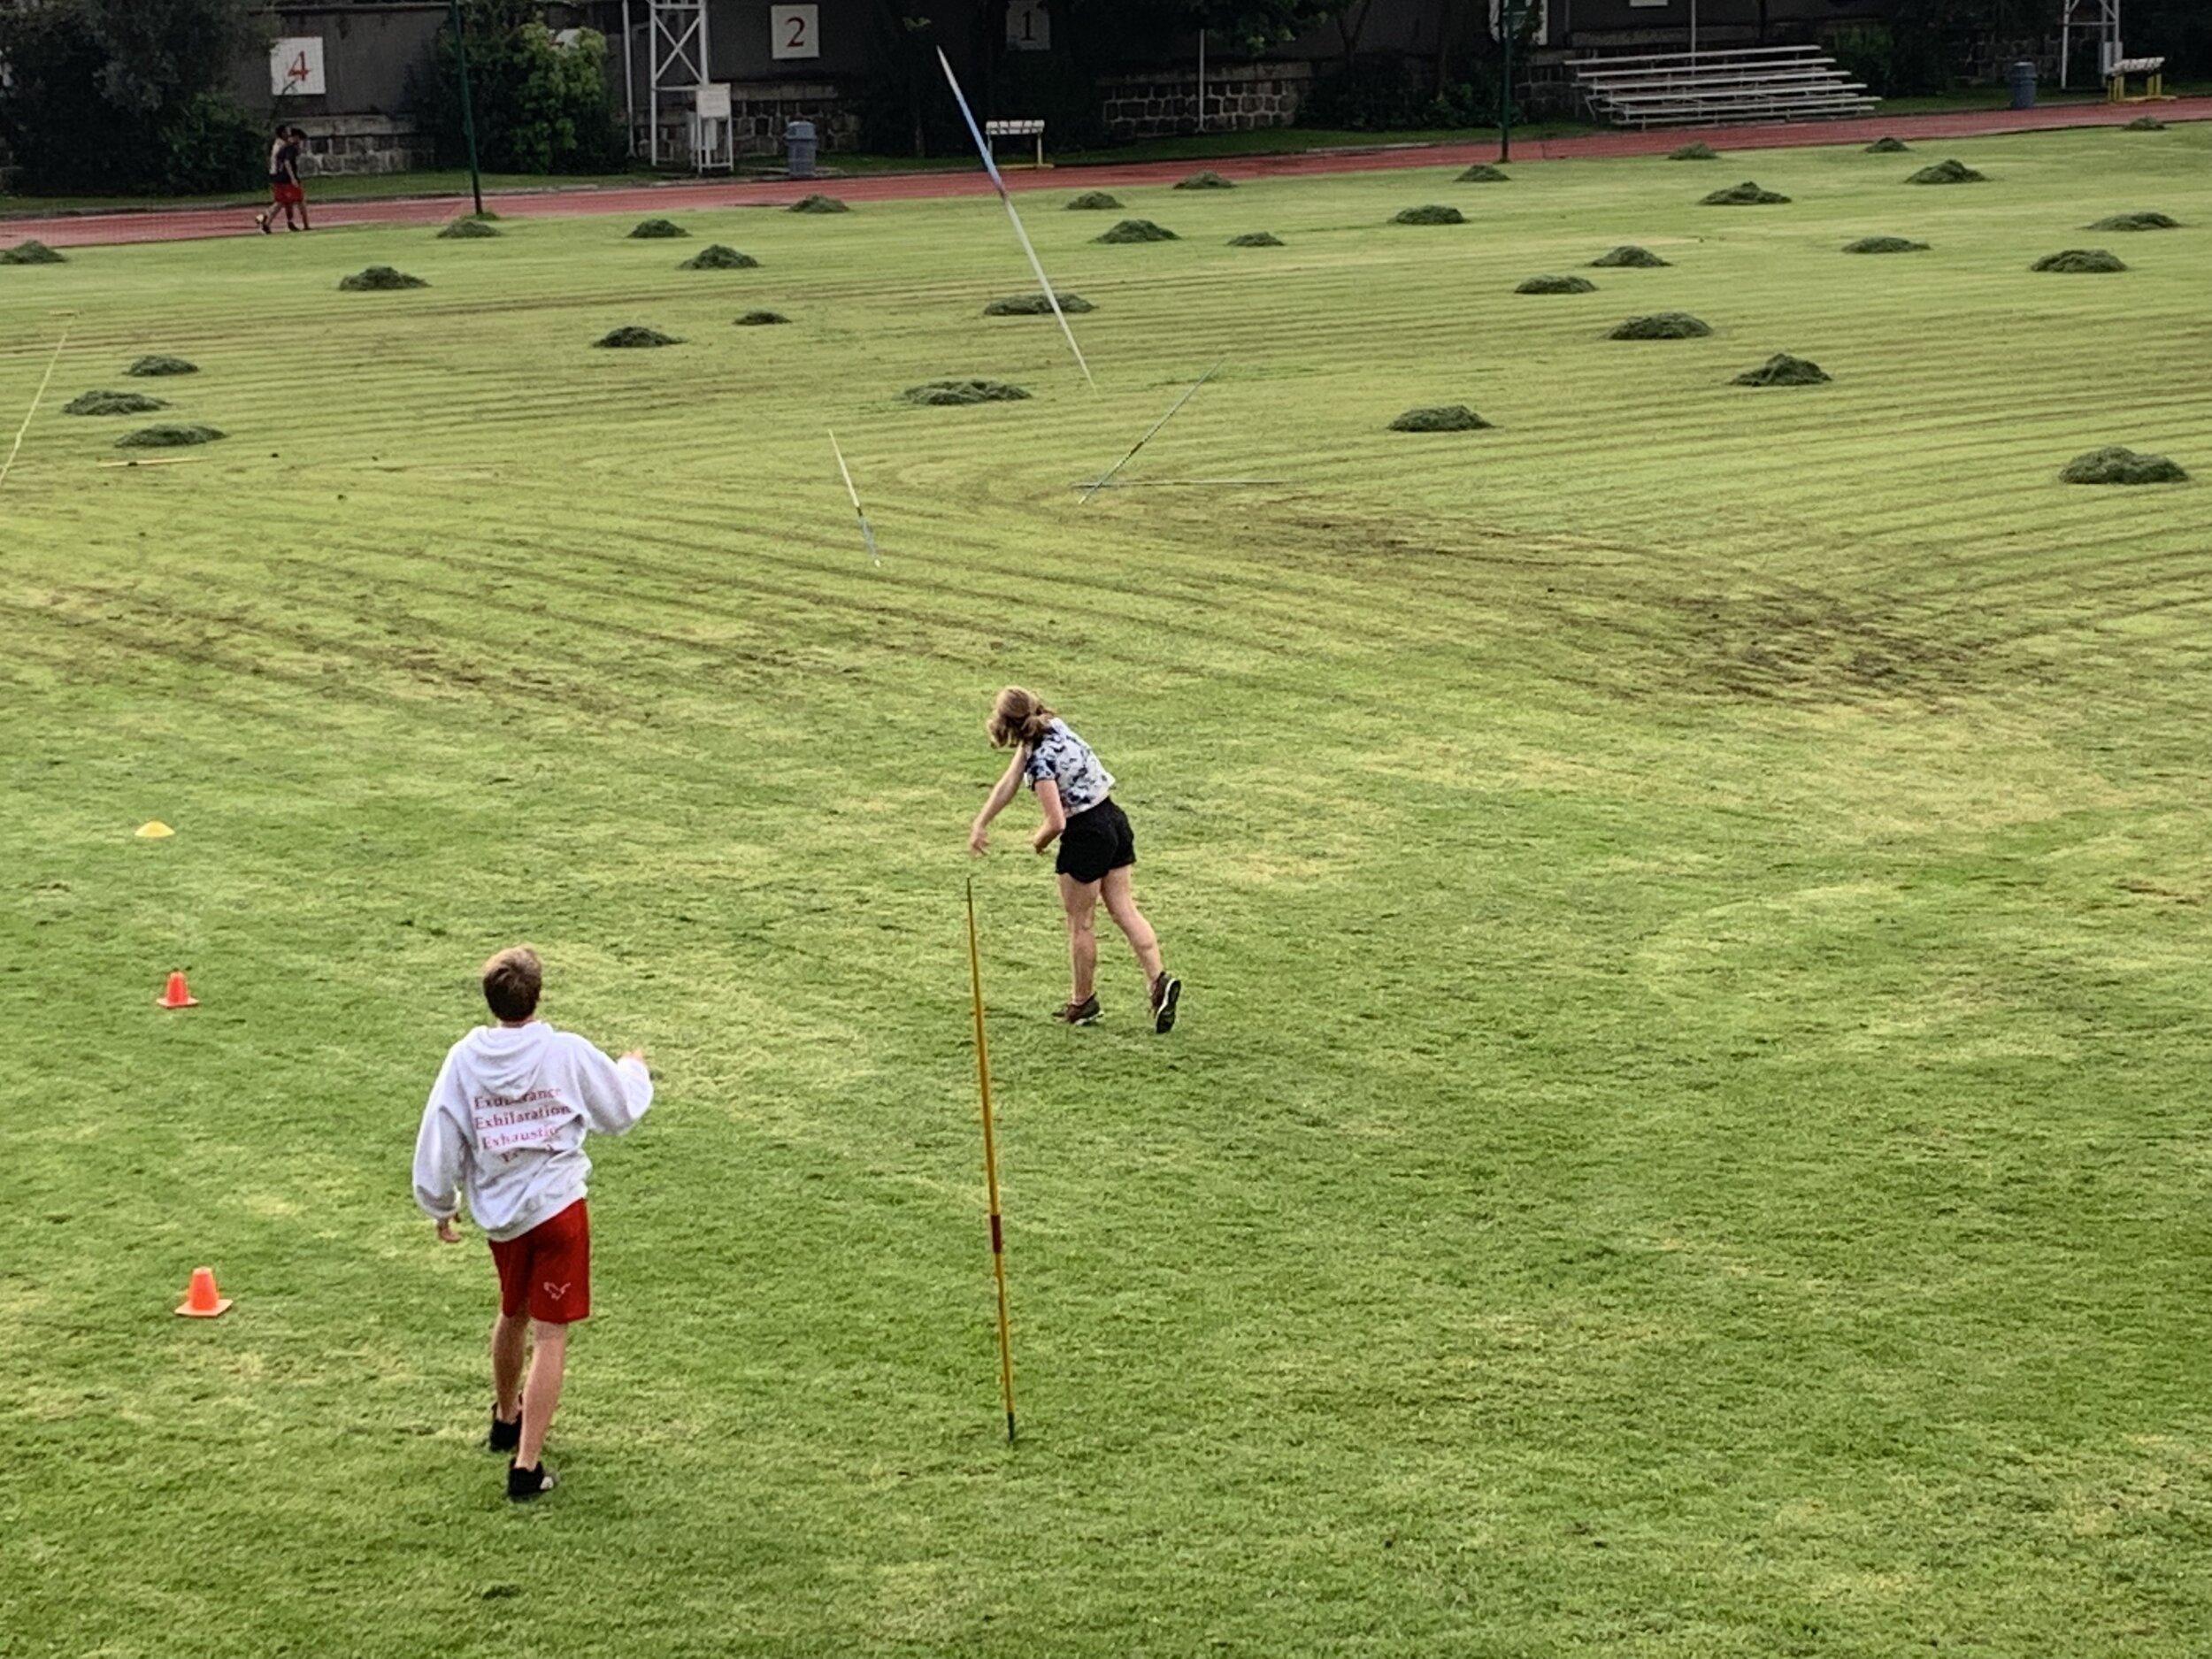 Maya javelin practice #2.jpg